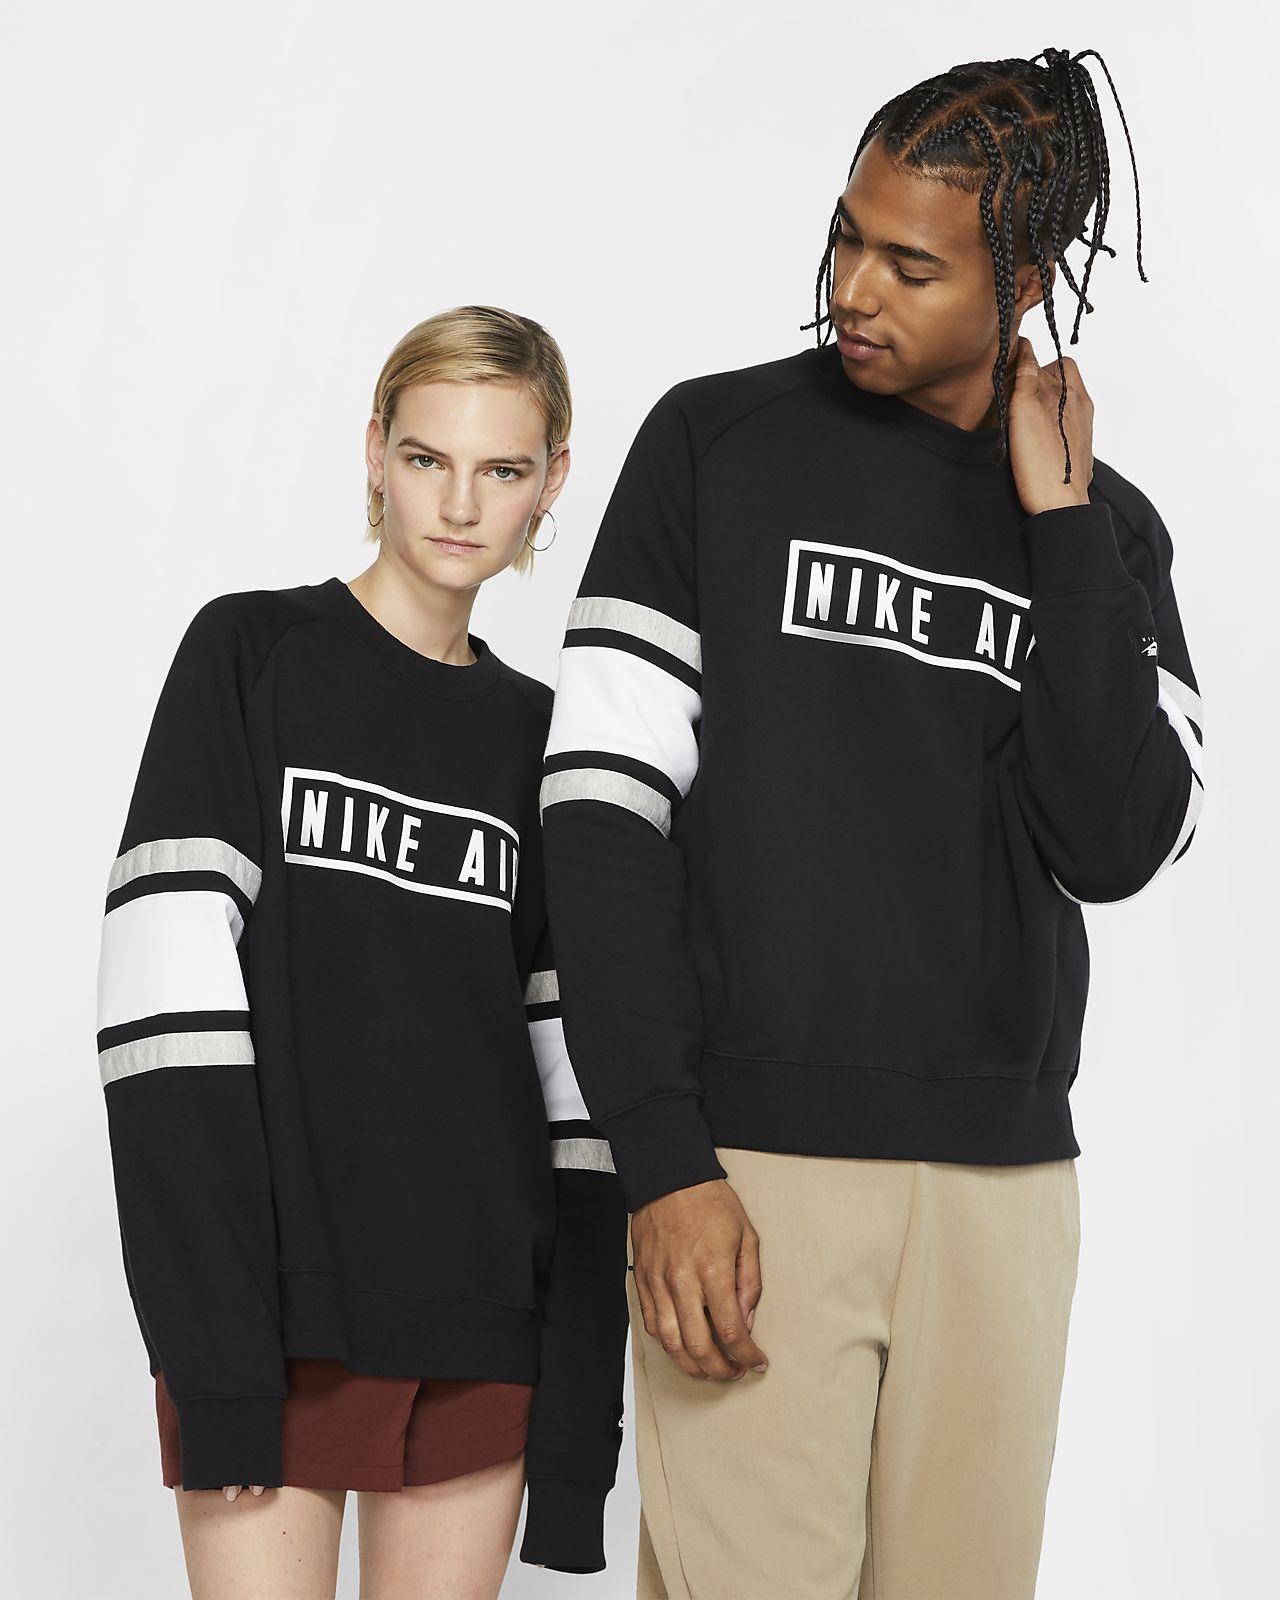 Nike Air Fleeceshirt met ronde hals